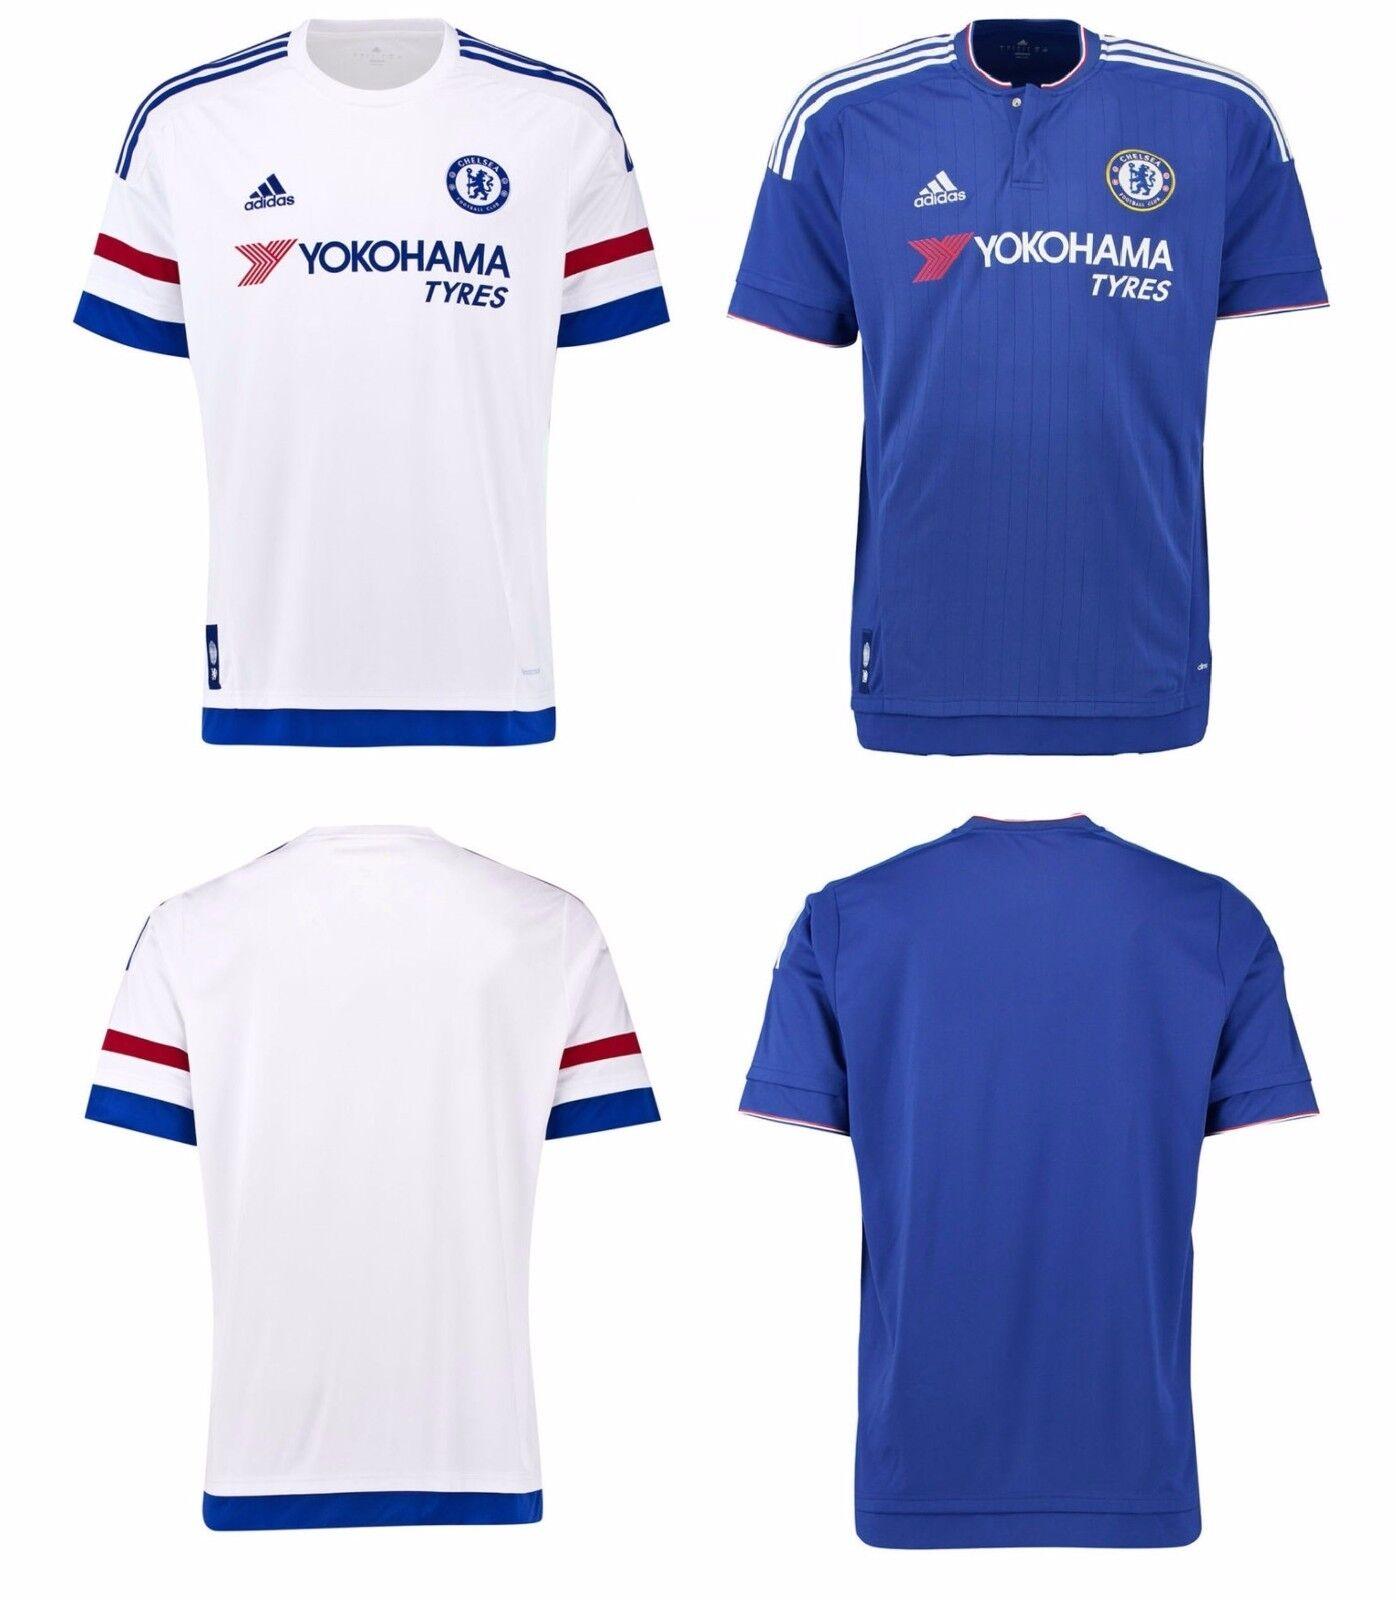 huge discount 1594b bcf8e Retro Chelsea Shirts Ebay | Azərbaycan Dillər Universiteti